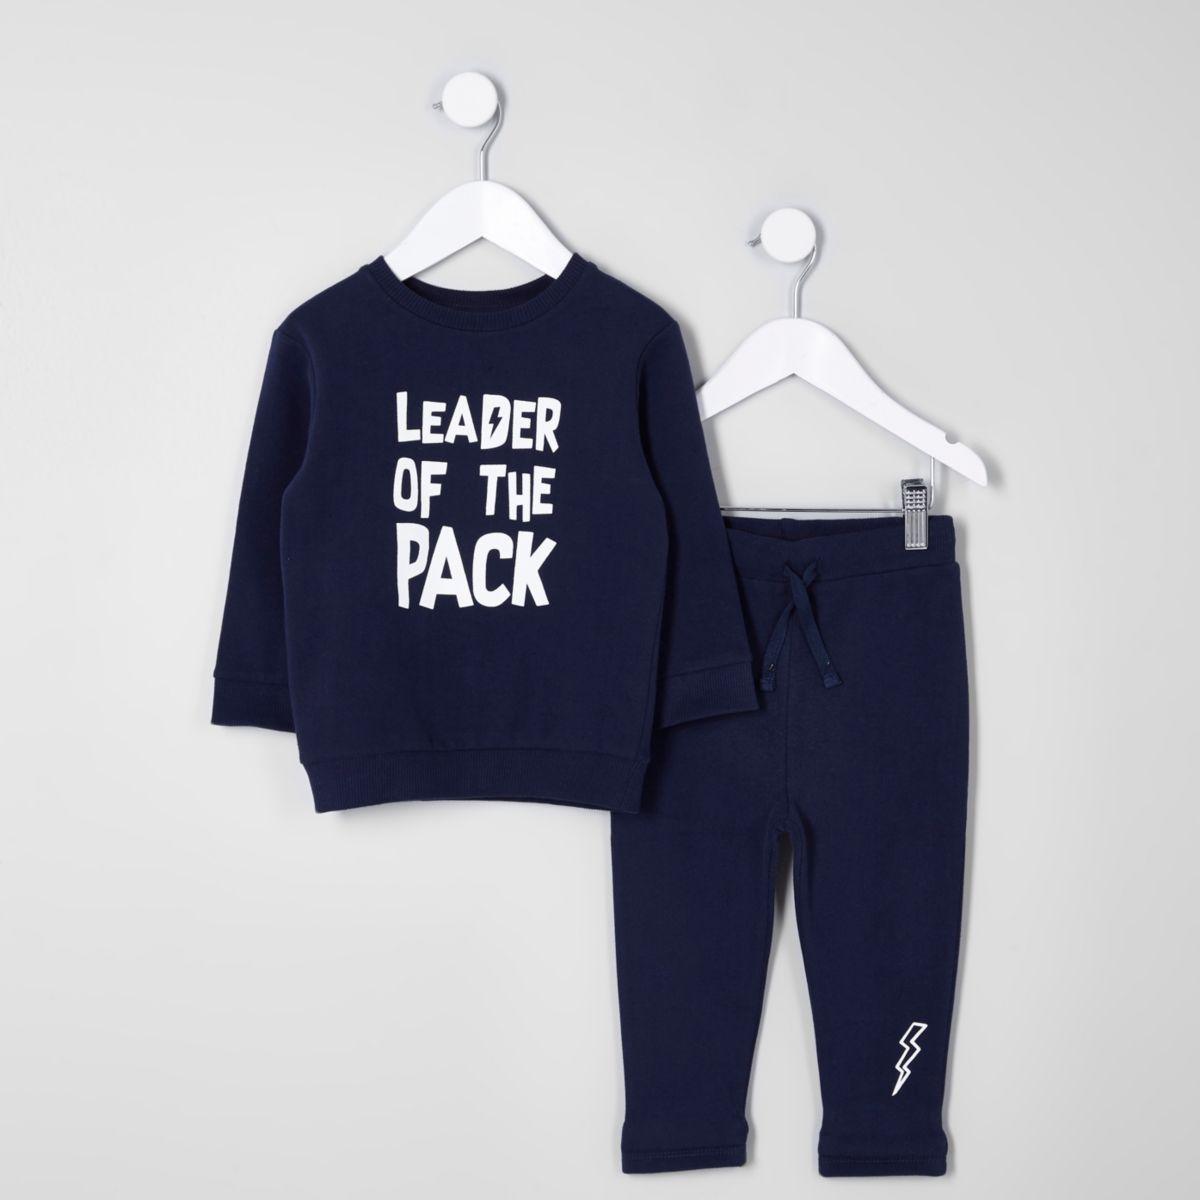 Mini boys navy 'leader' sweatshirt outfit